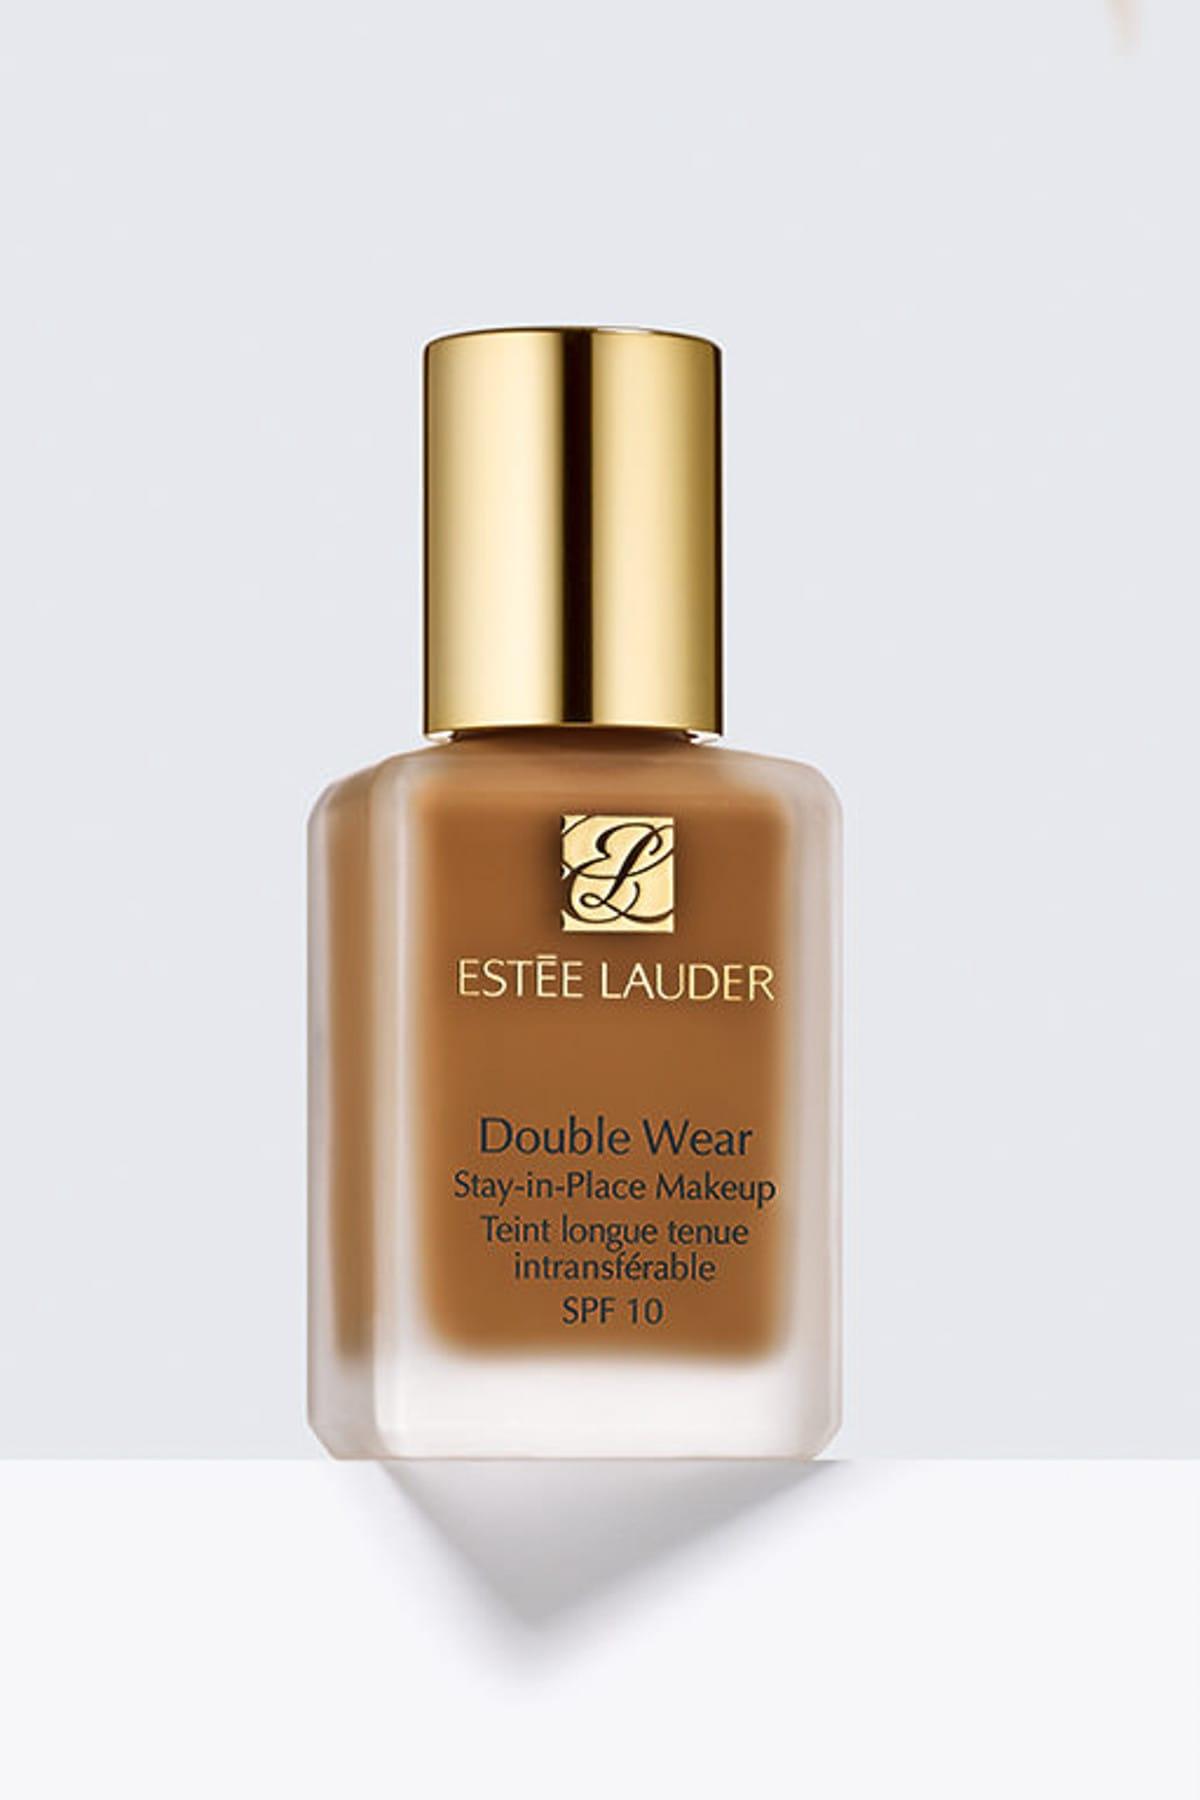 Estee Lauder Fondöten - Double Wear Foundation S.I.P Spf10 5C1 Rich Chestnut30 ml 27131830771 1